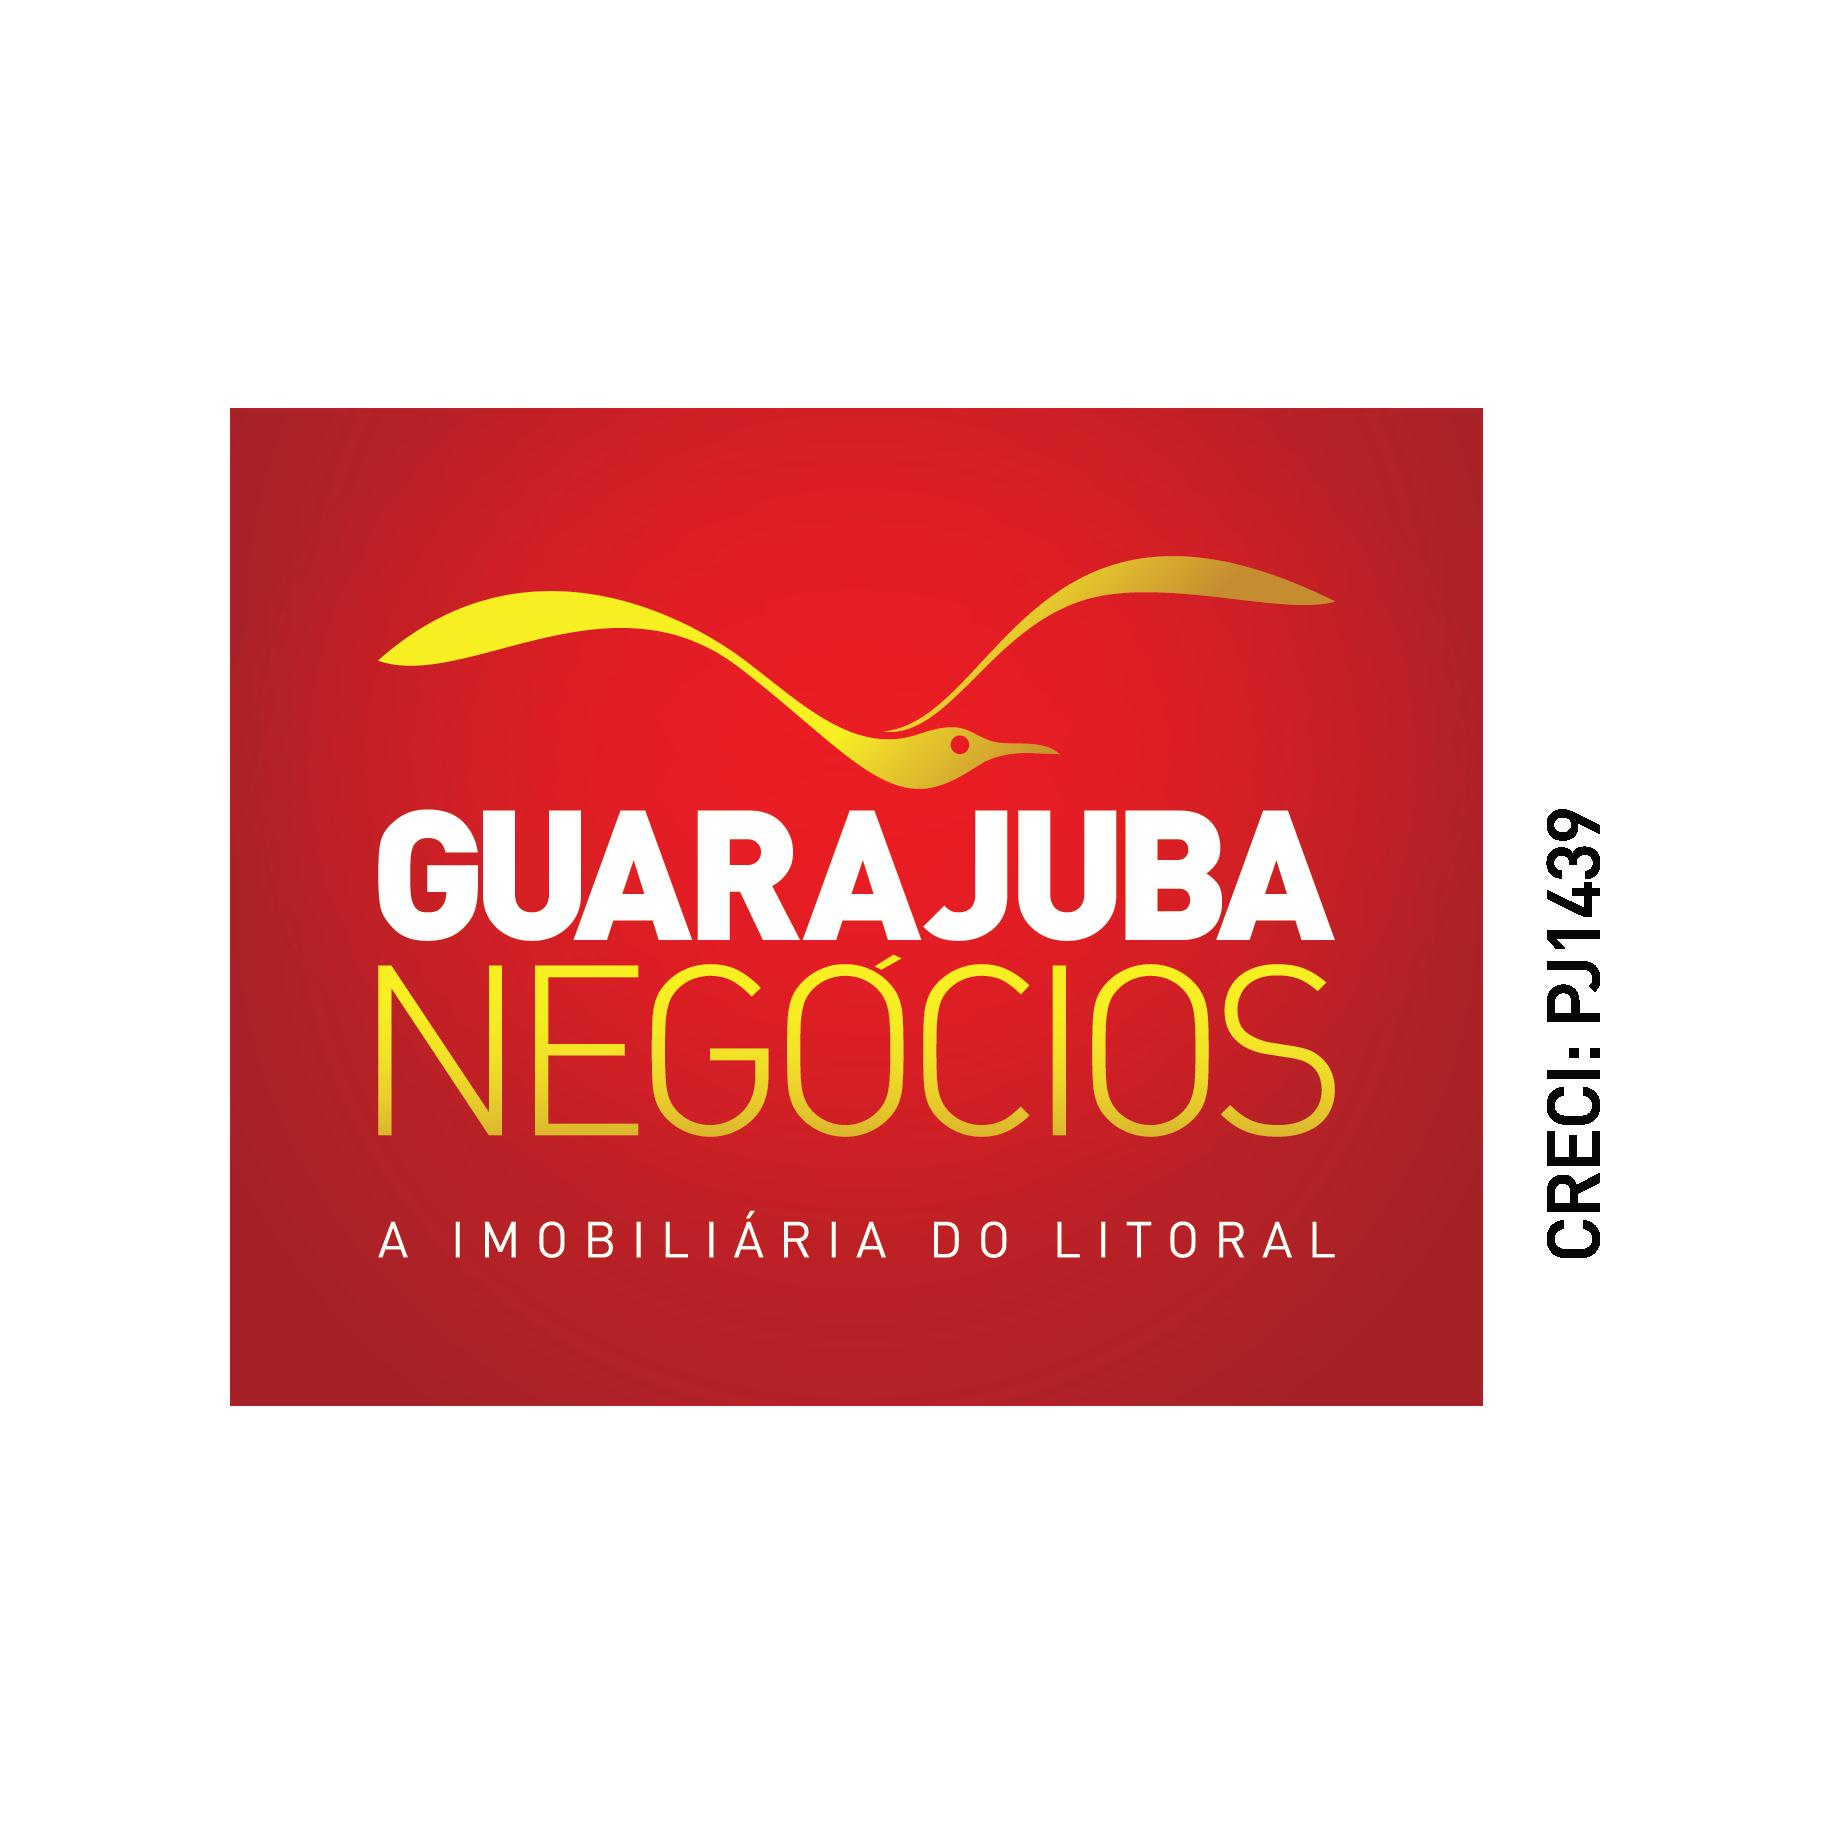 Guarajuba Negócios Ltda.